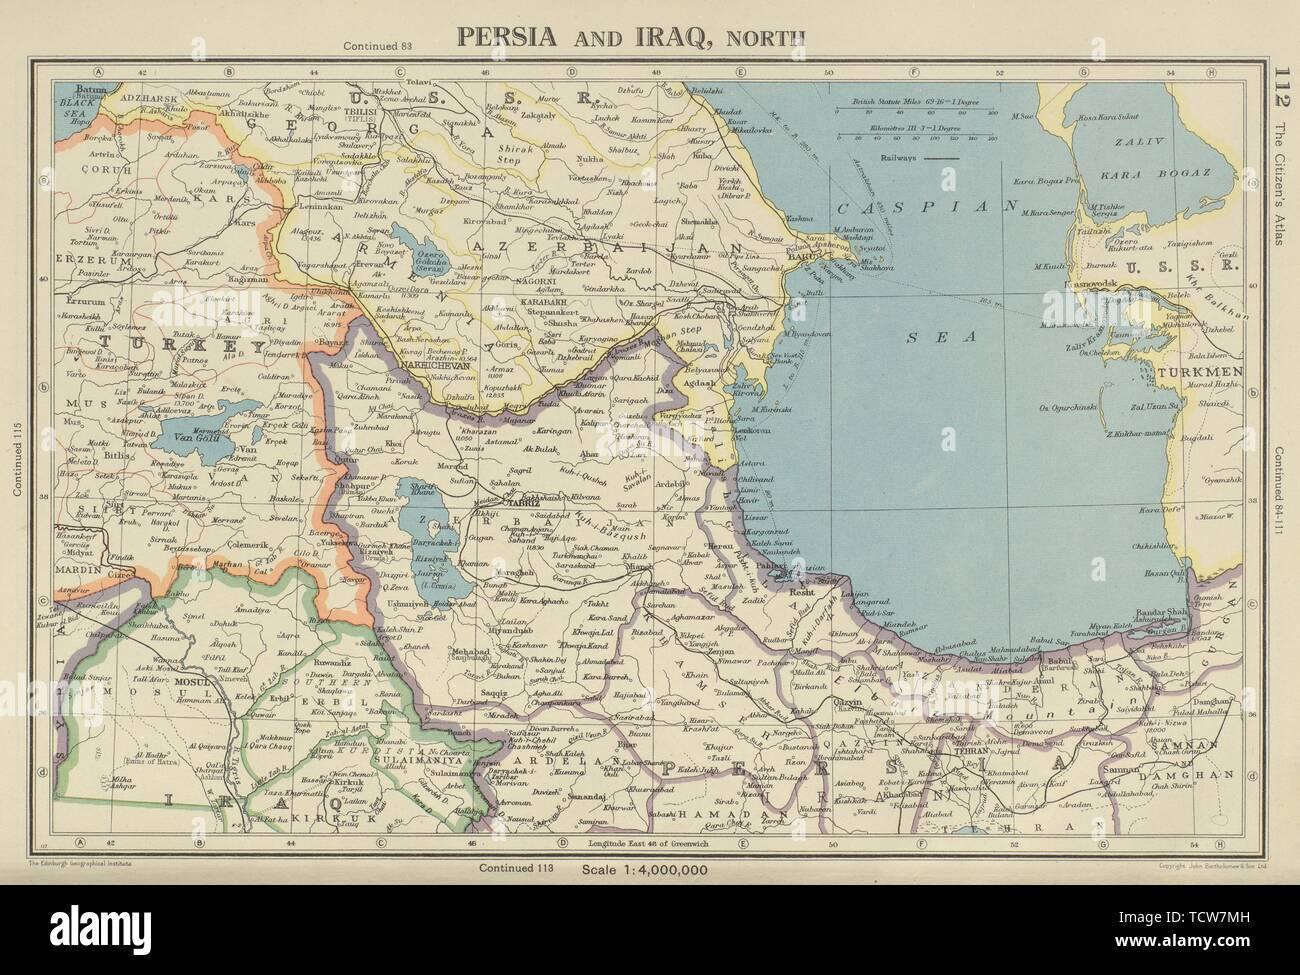 SOUTHERN CAUCASUS  Persia (Iran) North Iraq  Azerbaijan Armenia